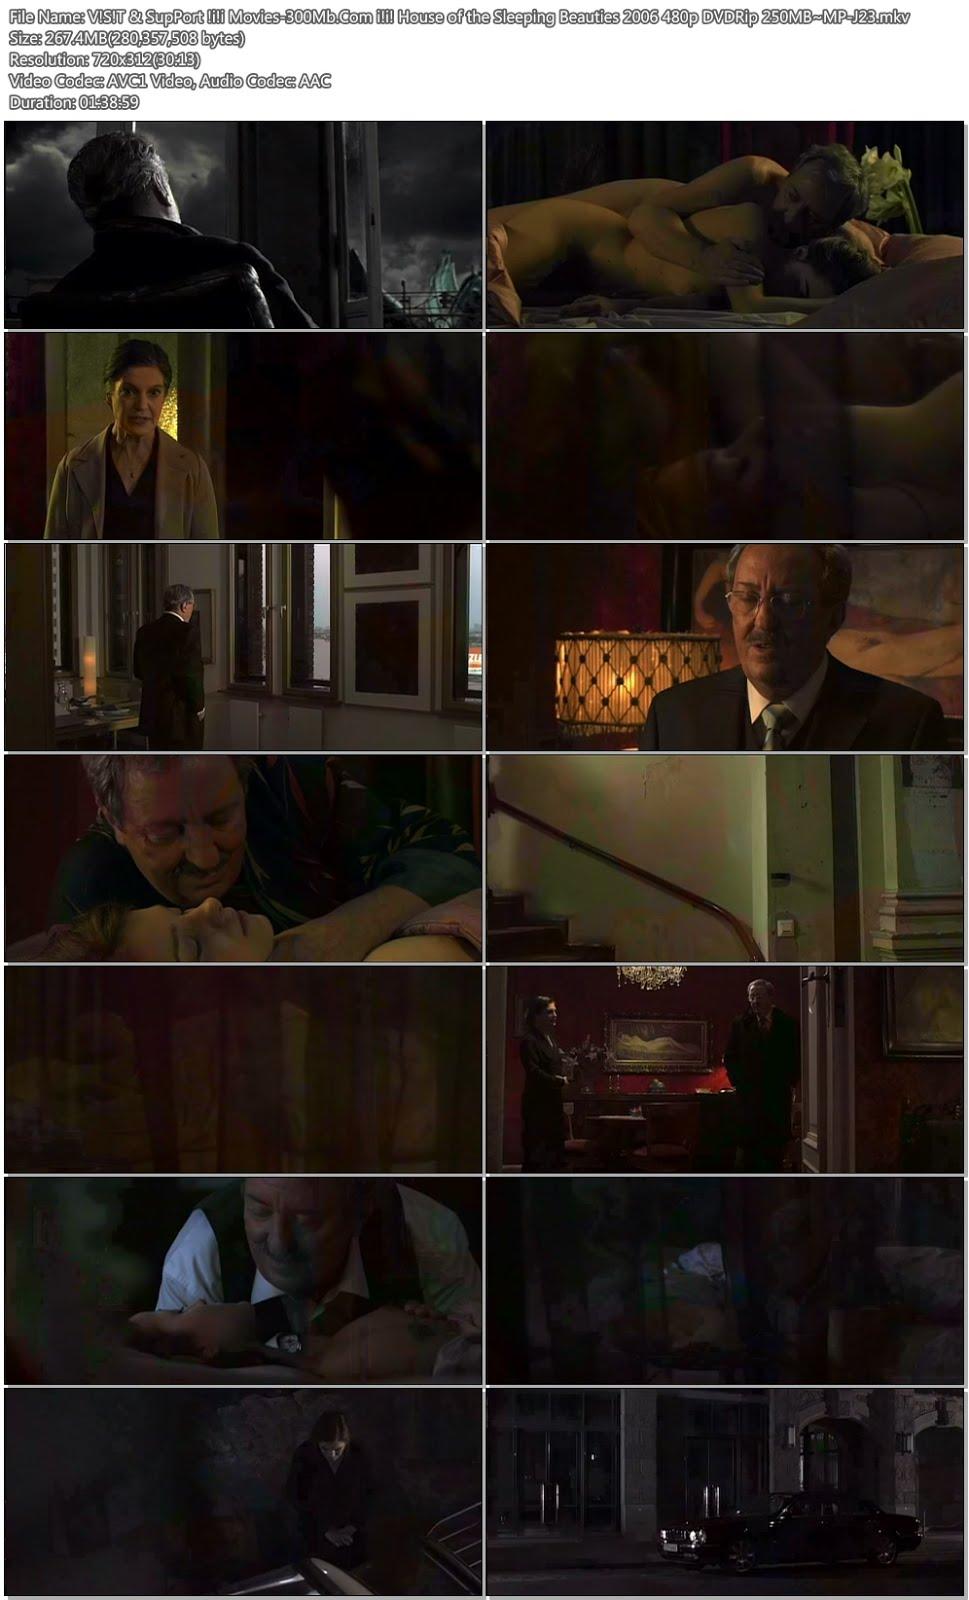 [18+] House of the Sleeping Beauties 2006 480p DVDRip 250MB Screenshot